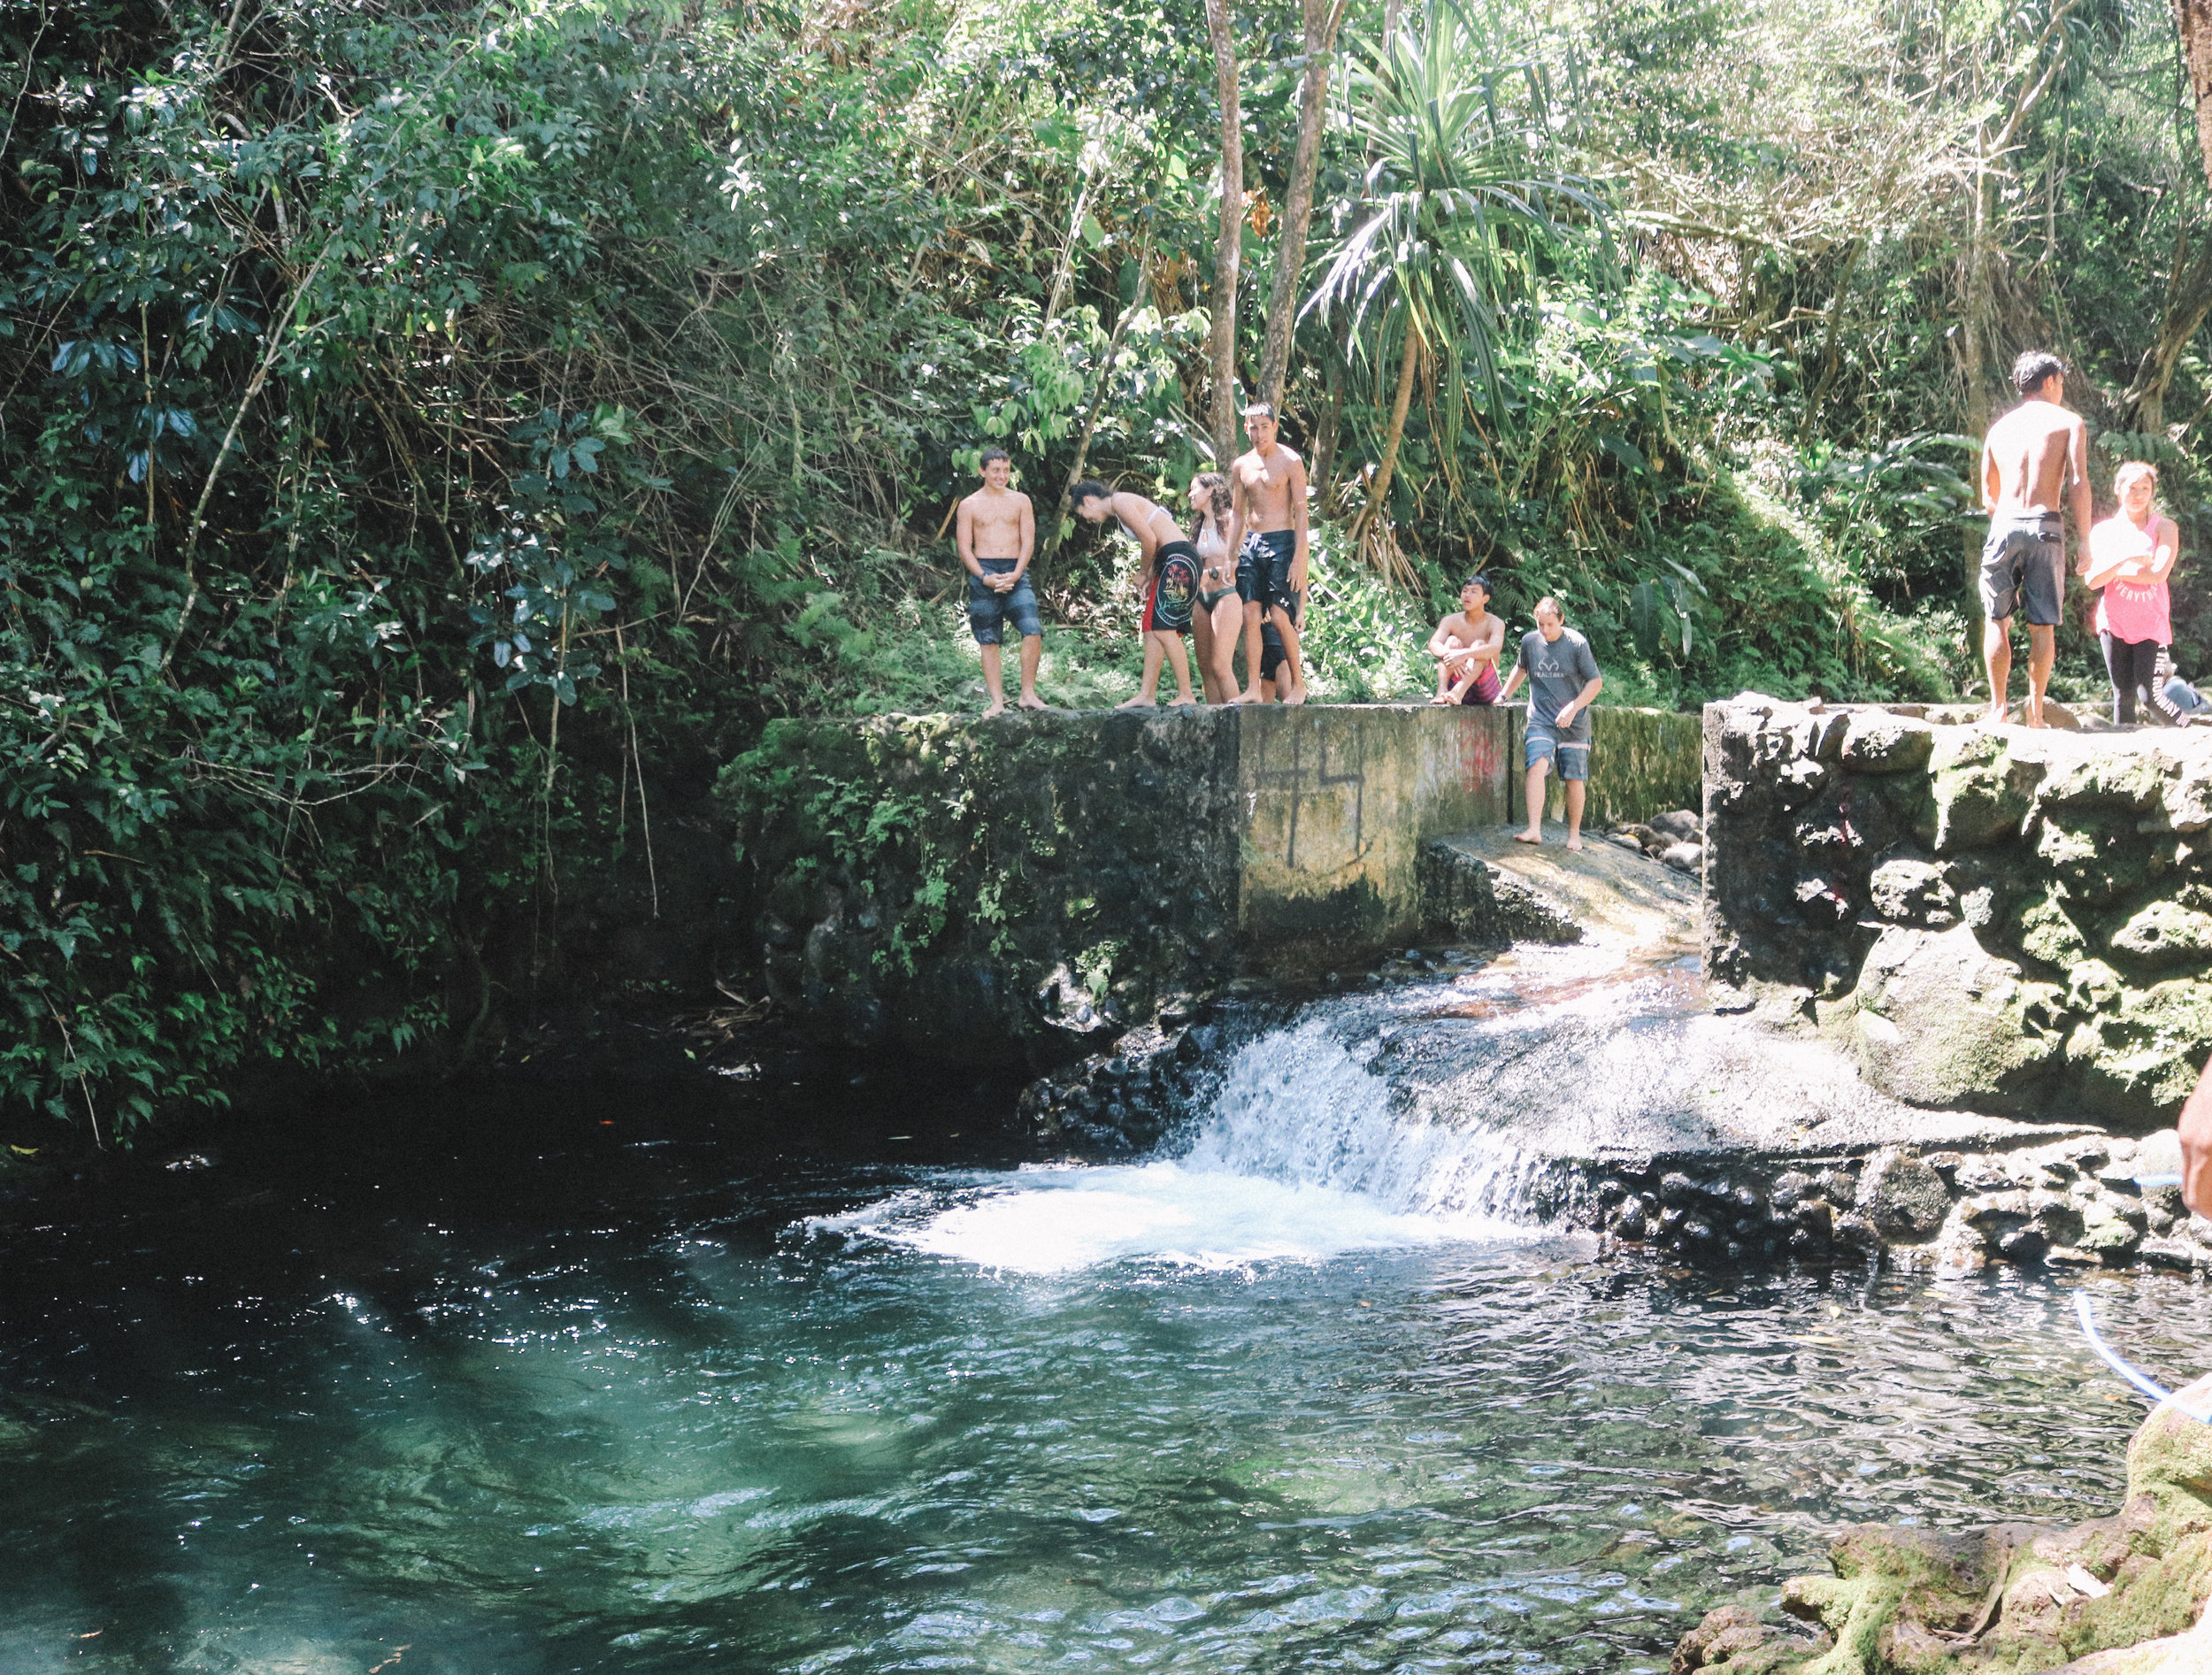 Hamama Falls, Wahie'e Falls, Waterfall Hike, Oahu Waterfall Hikes, Oahu Hike, Waterfall, Hawaii, Hawaii Waterfall, Hawaii Waterfall Hike